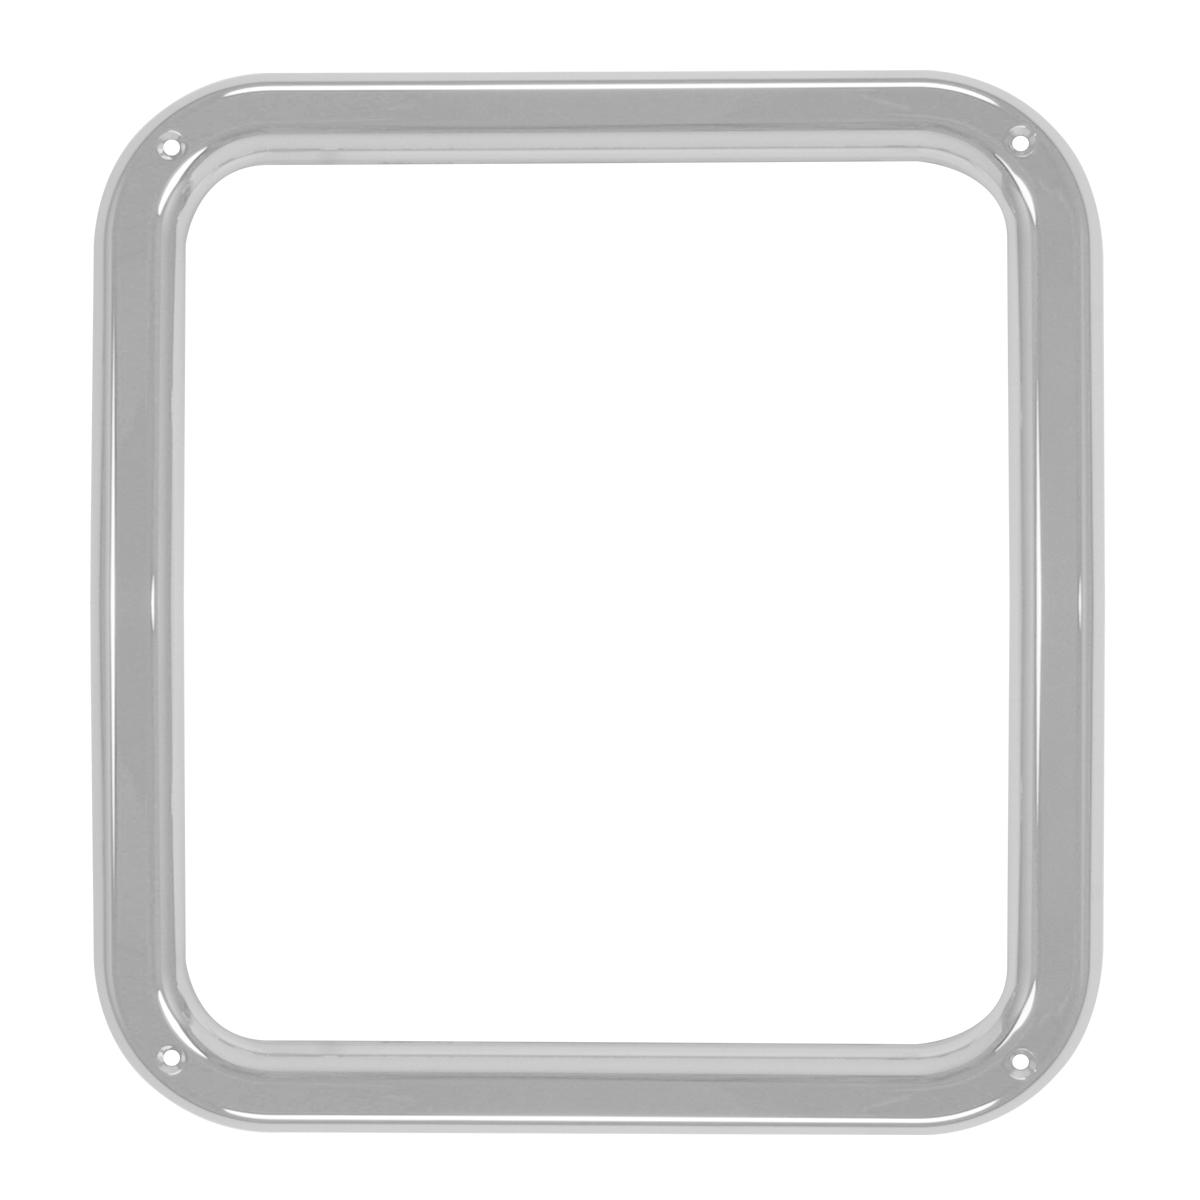 97555 Outside Daylight Cab Door Window Trim for Kenworth W900's